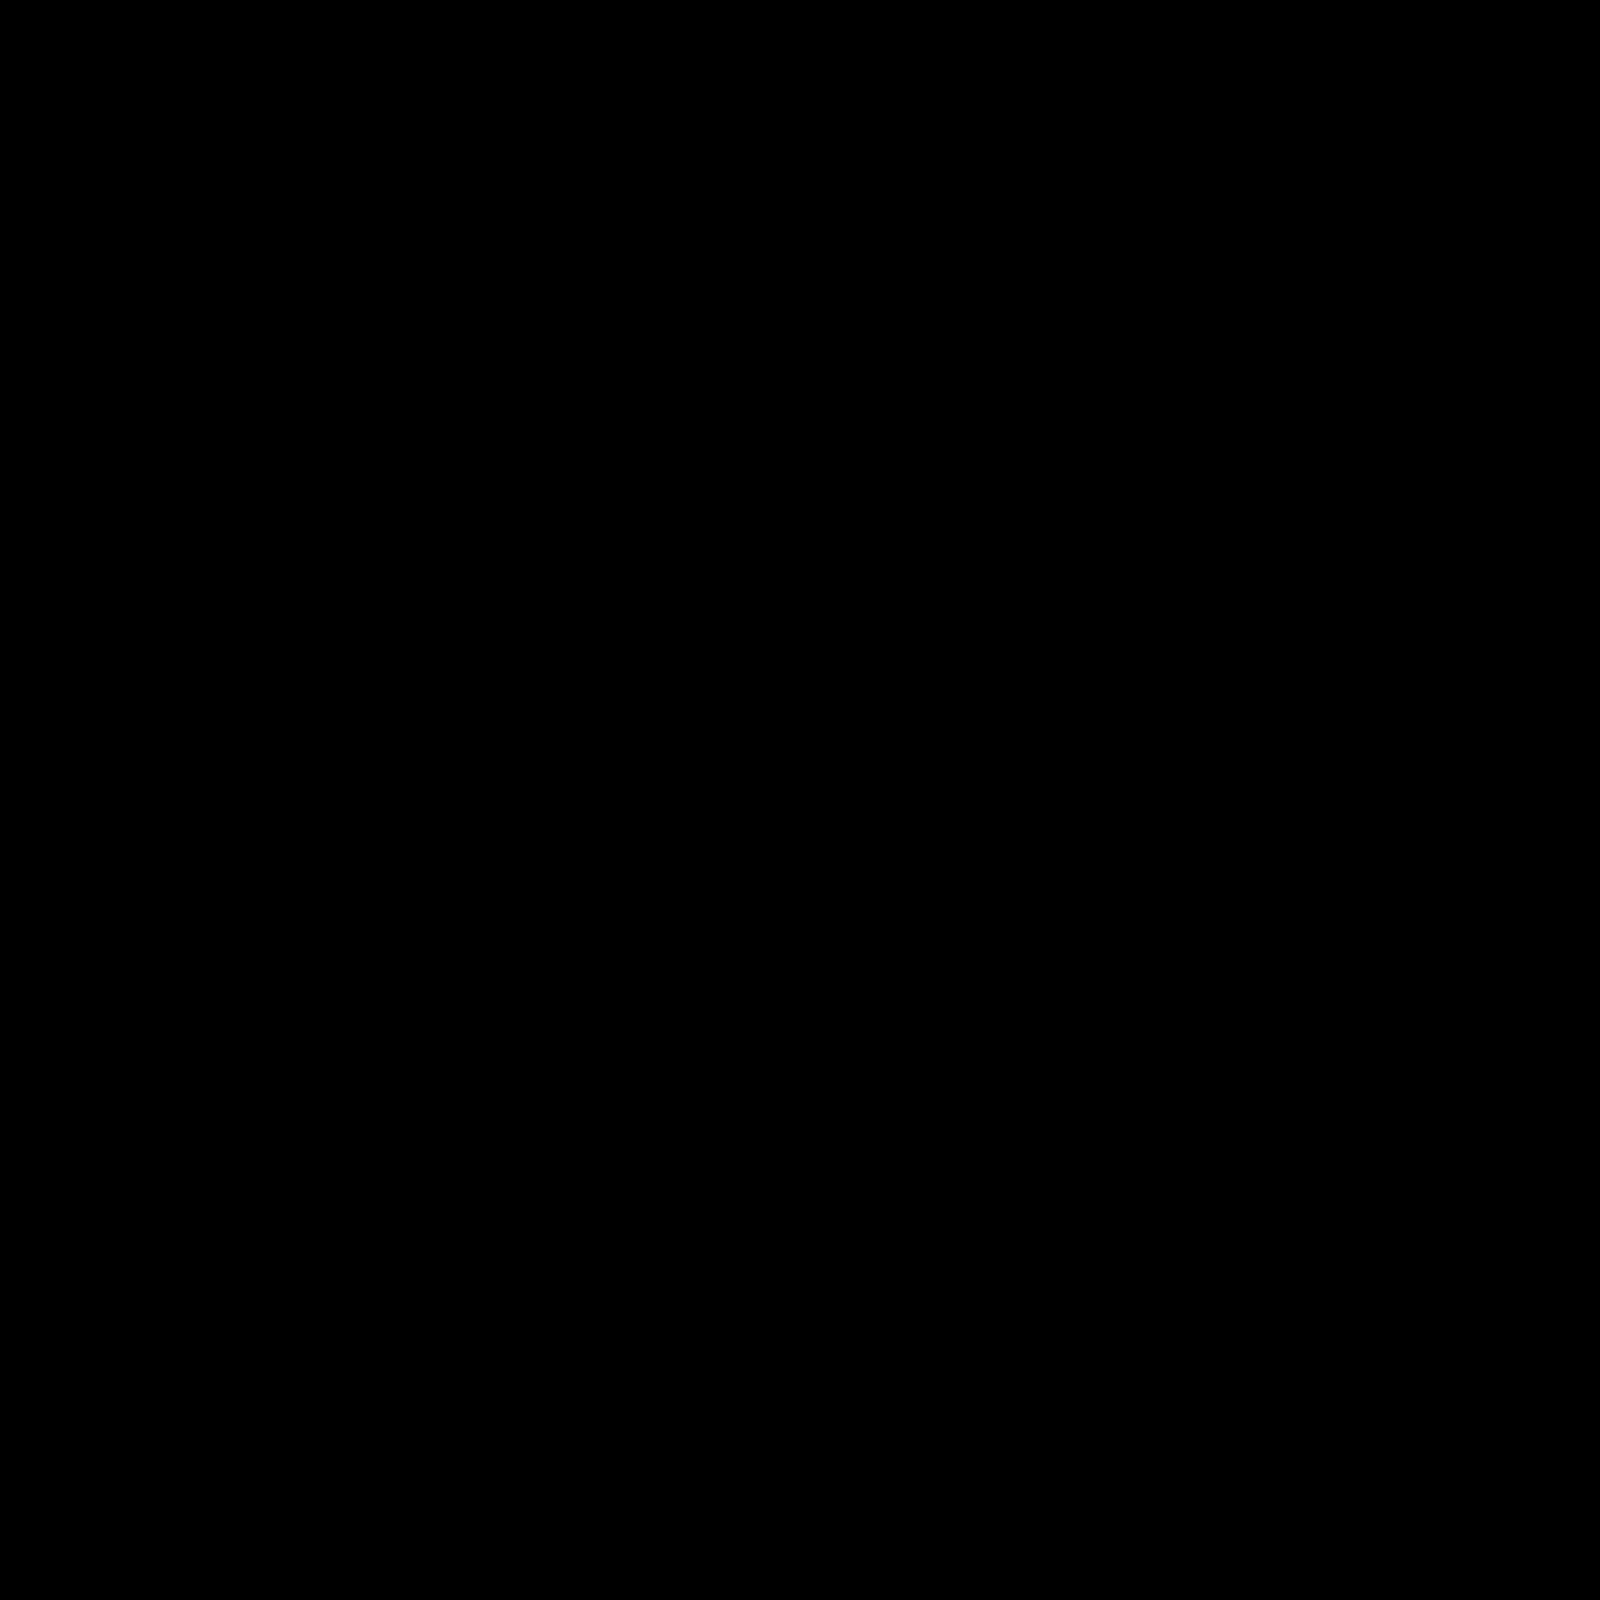 Pączek icon